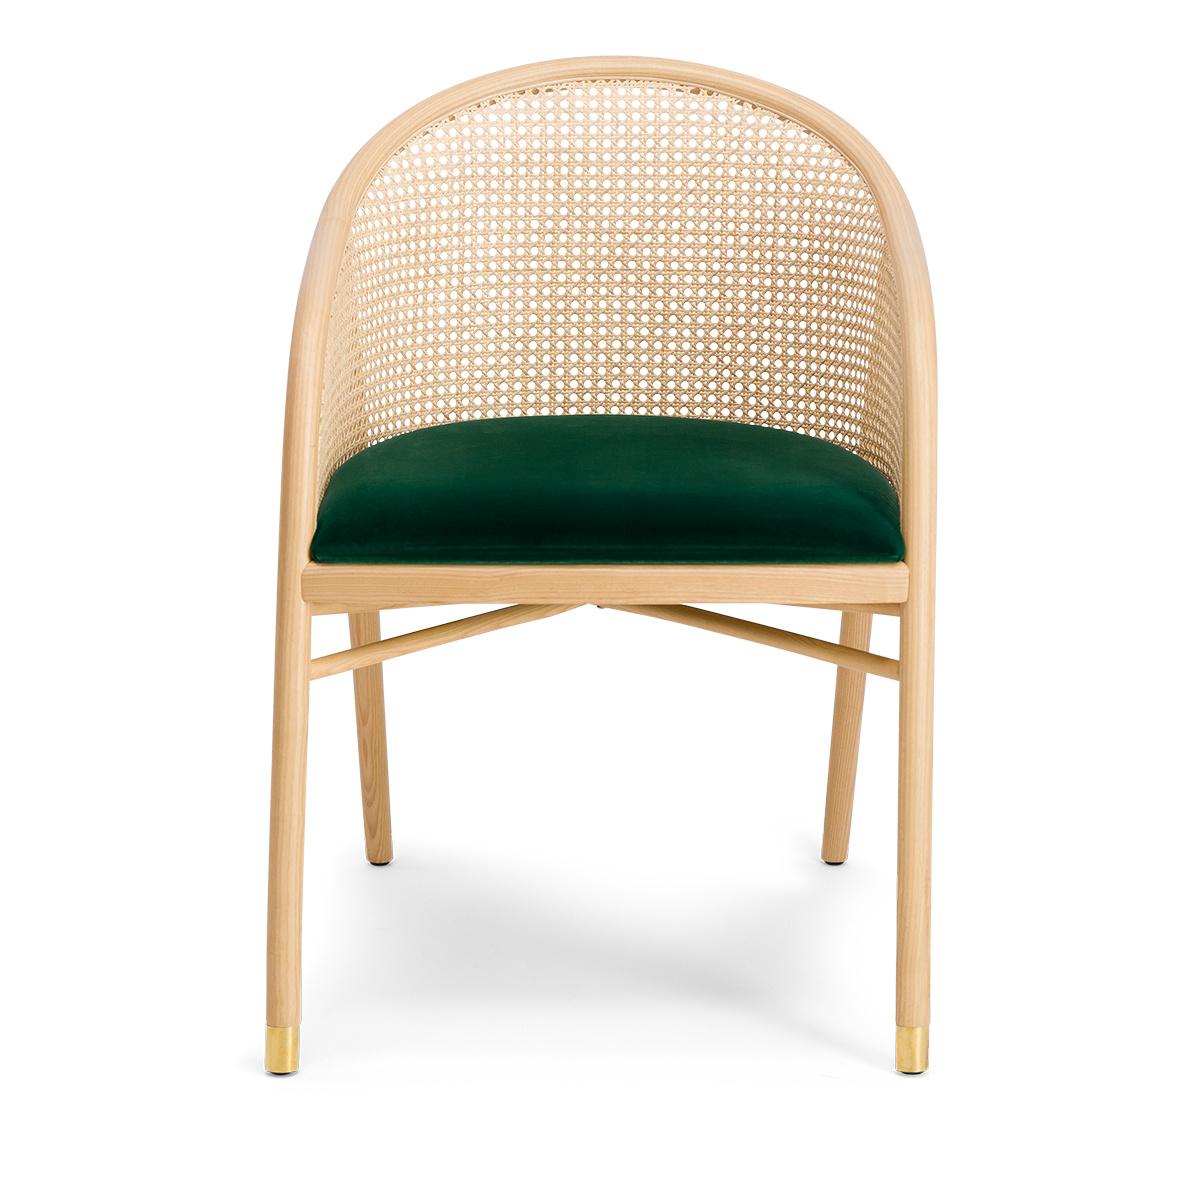 Cavallo Armchair, Fir Green Velvet with Natural Frame